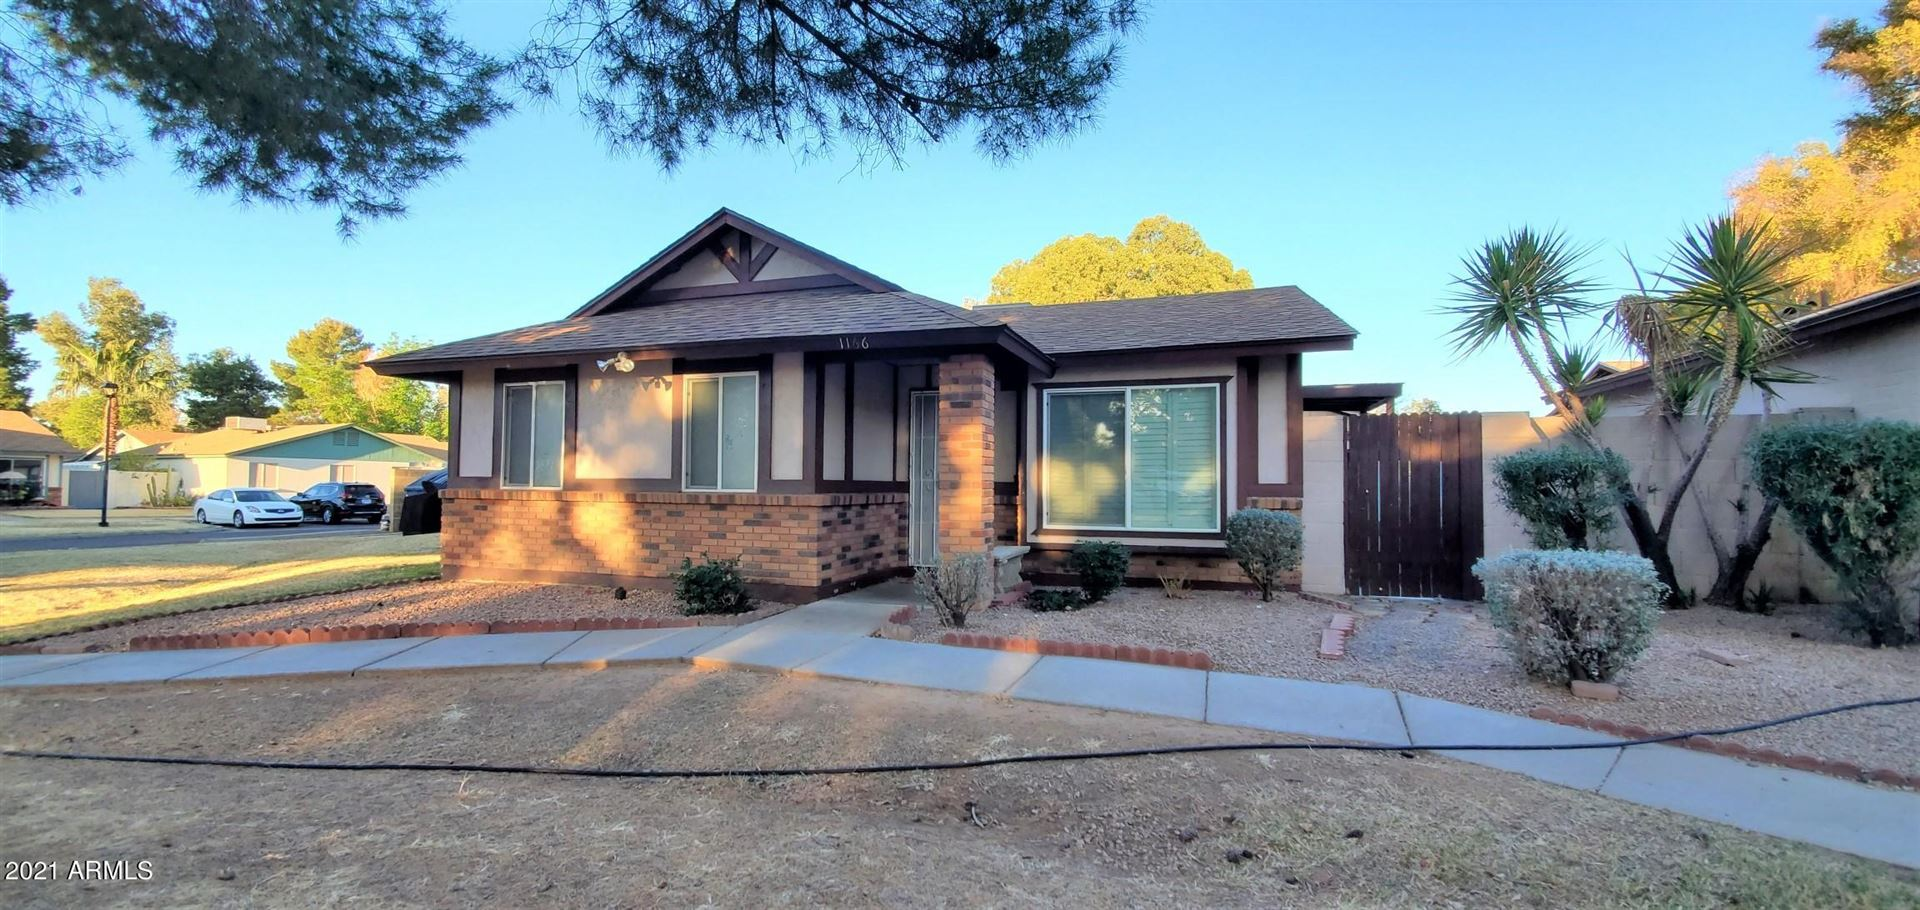 Photo of 5135 E EVERGREEN Street #1166, Mesa, AZ 85205 (MLS # 6203581)